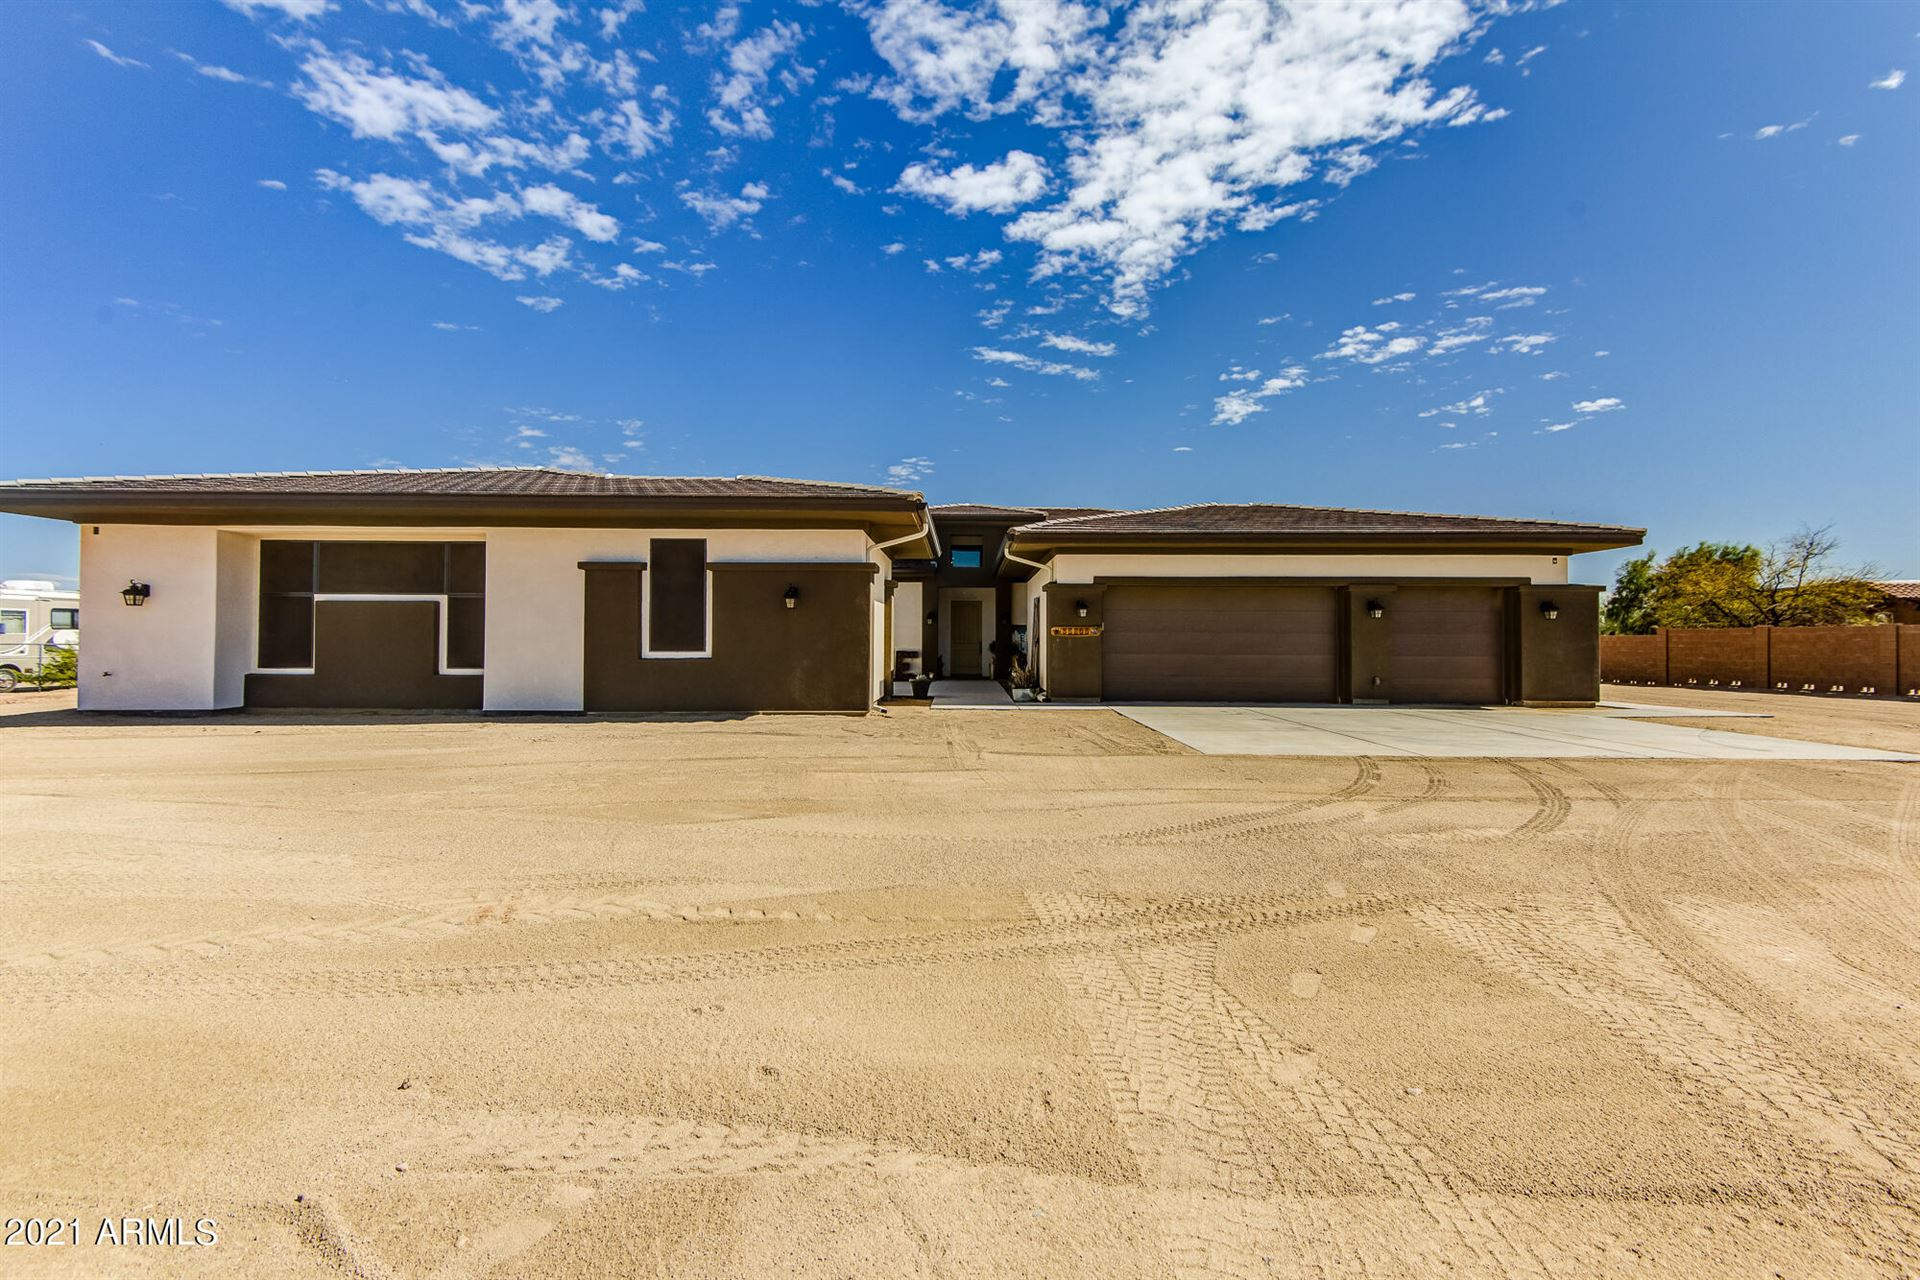 Photo of 35205 N 3rd Avenue, Desert Hills, AZ 85086 (MLS # 6255771)